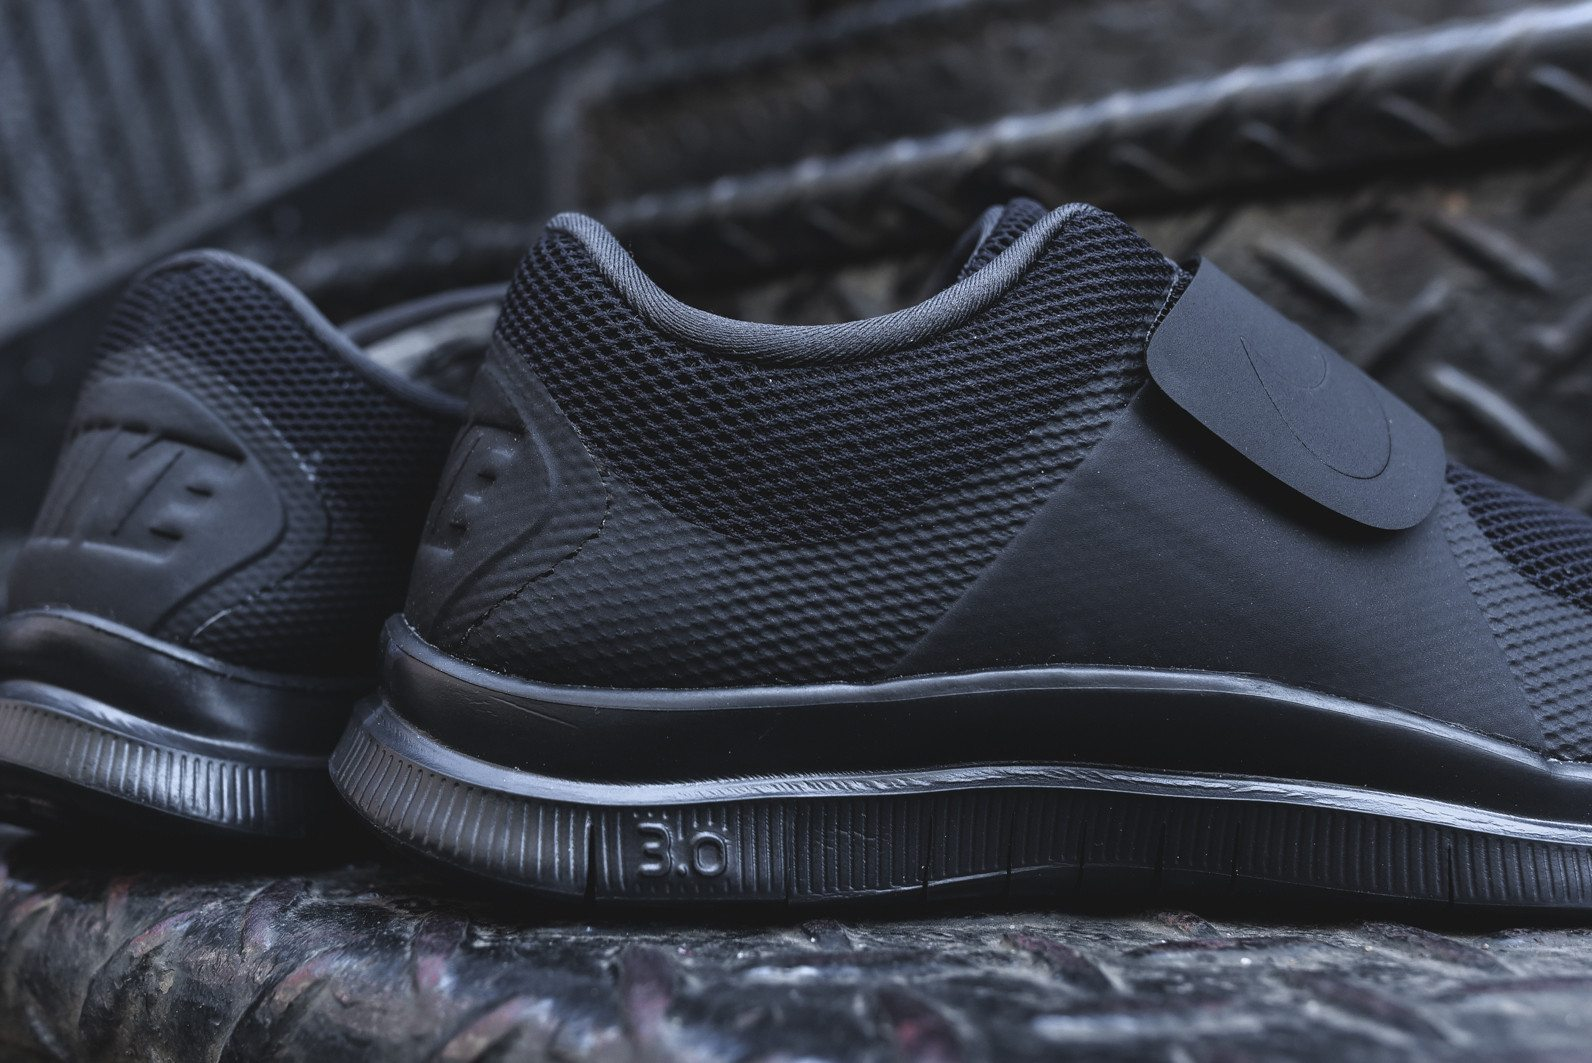 Nike Free Socfly Black Anthracite 7